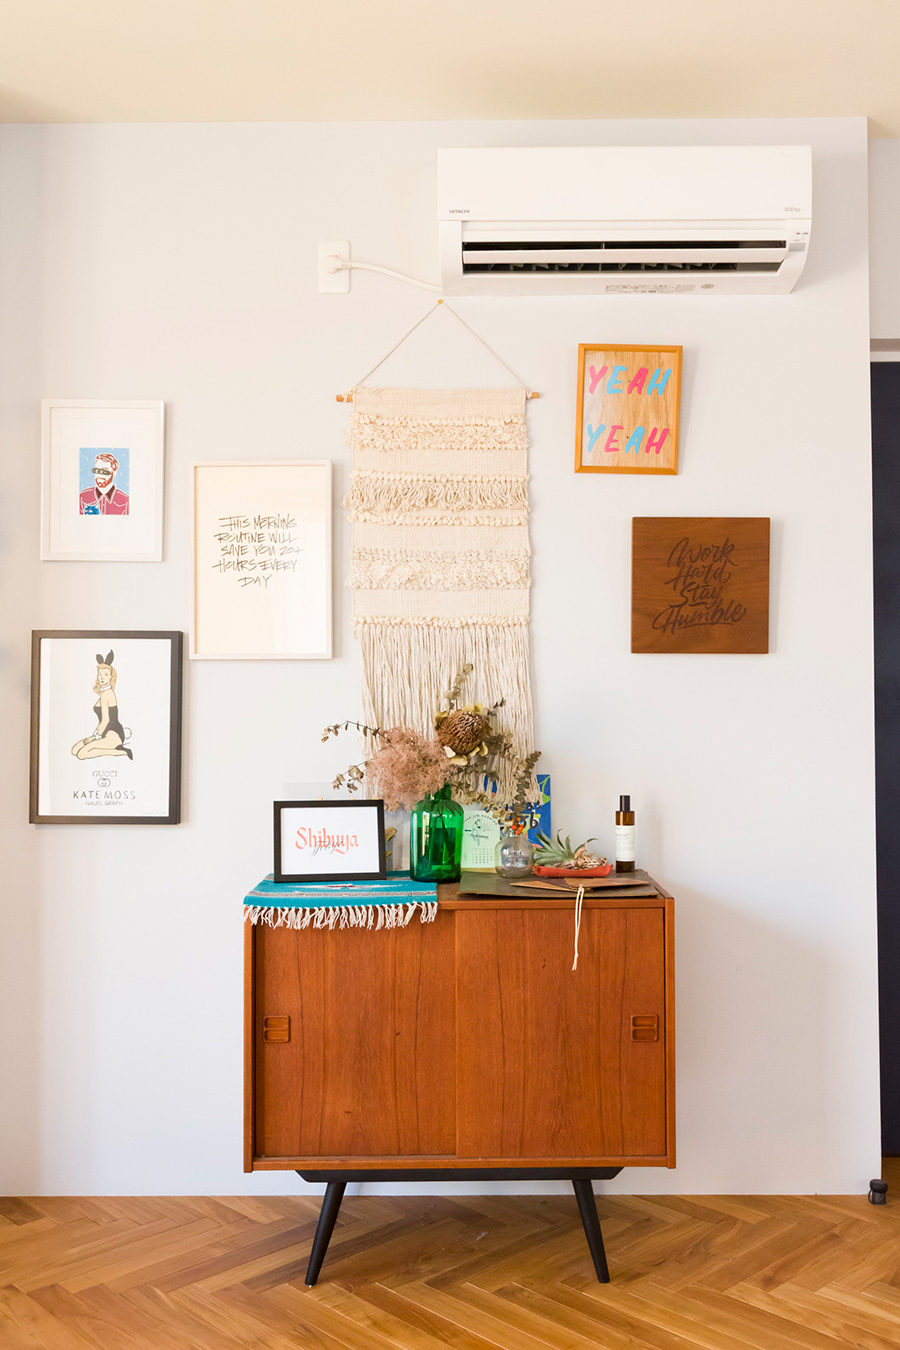 「green and black smithのウッドバーニング、レターボーイ、ナイジェルグラフ、MASAKI NAKAMURA、そして僕の作品を飾っています」